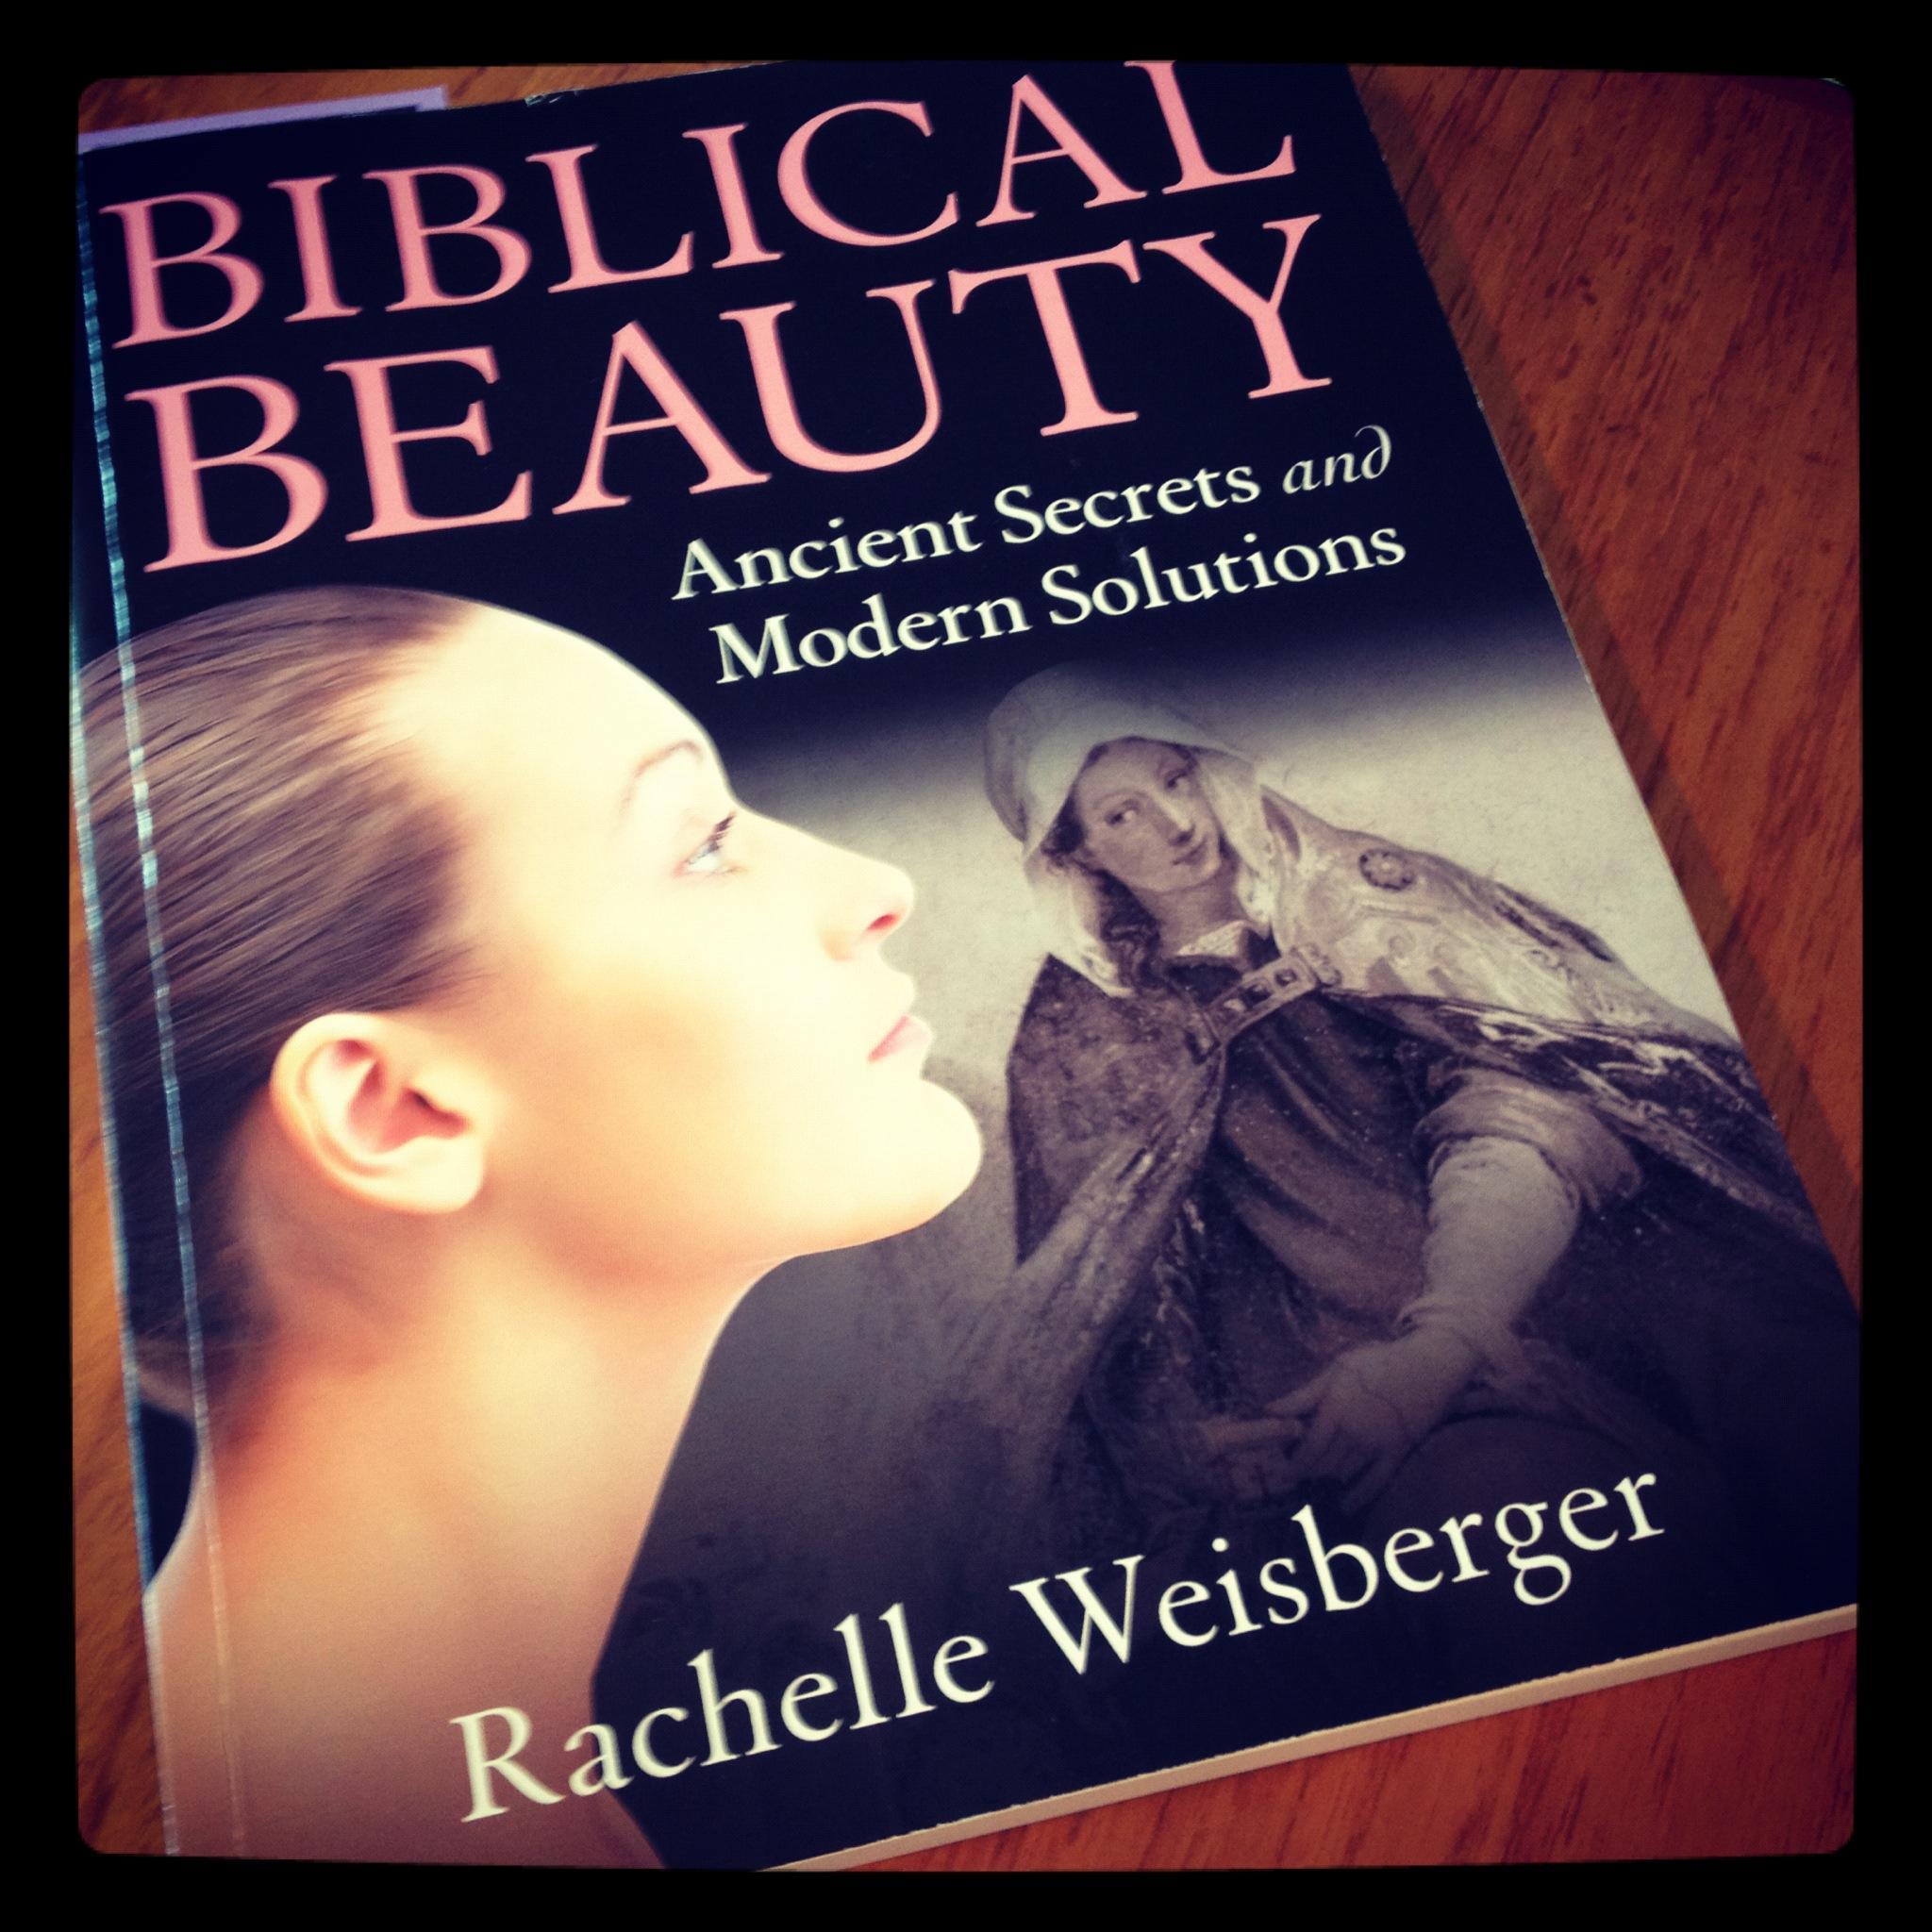 Biblical Beauty: A review